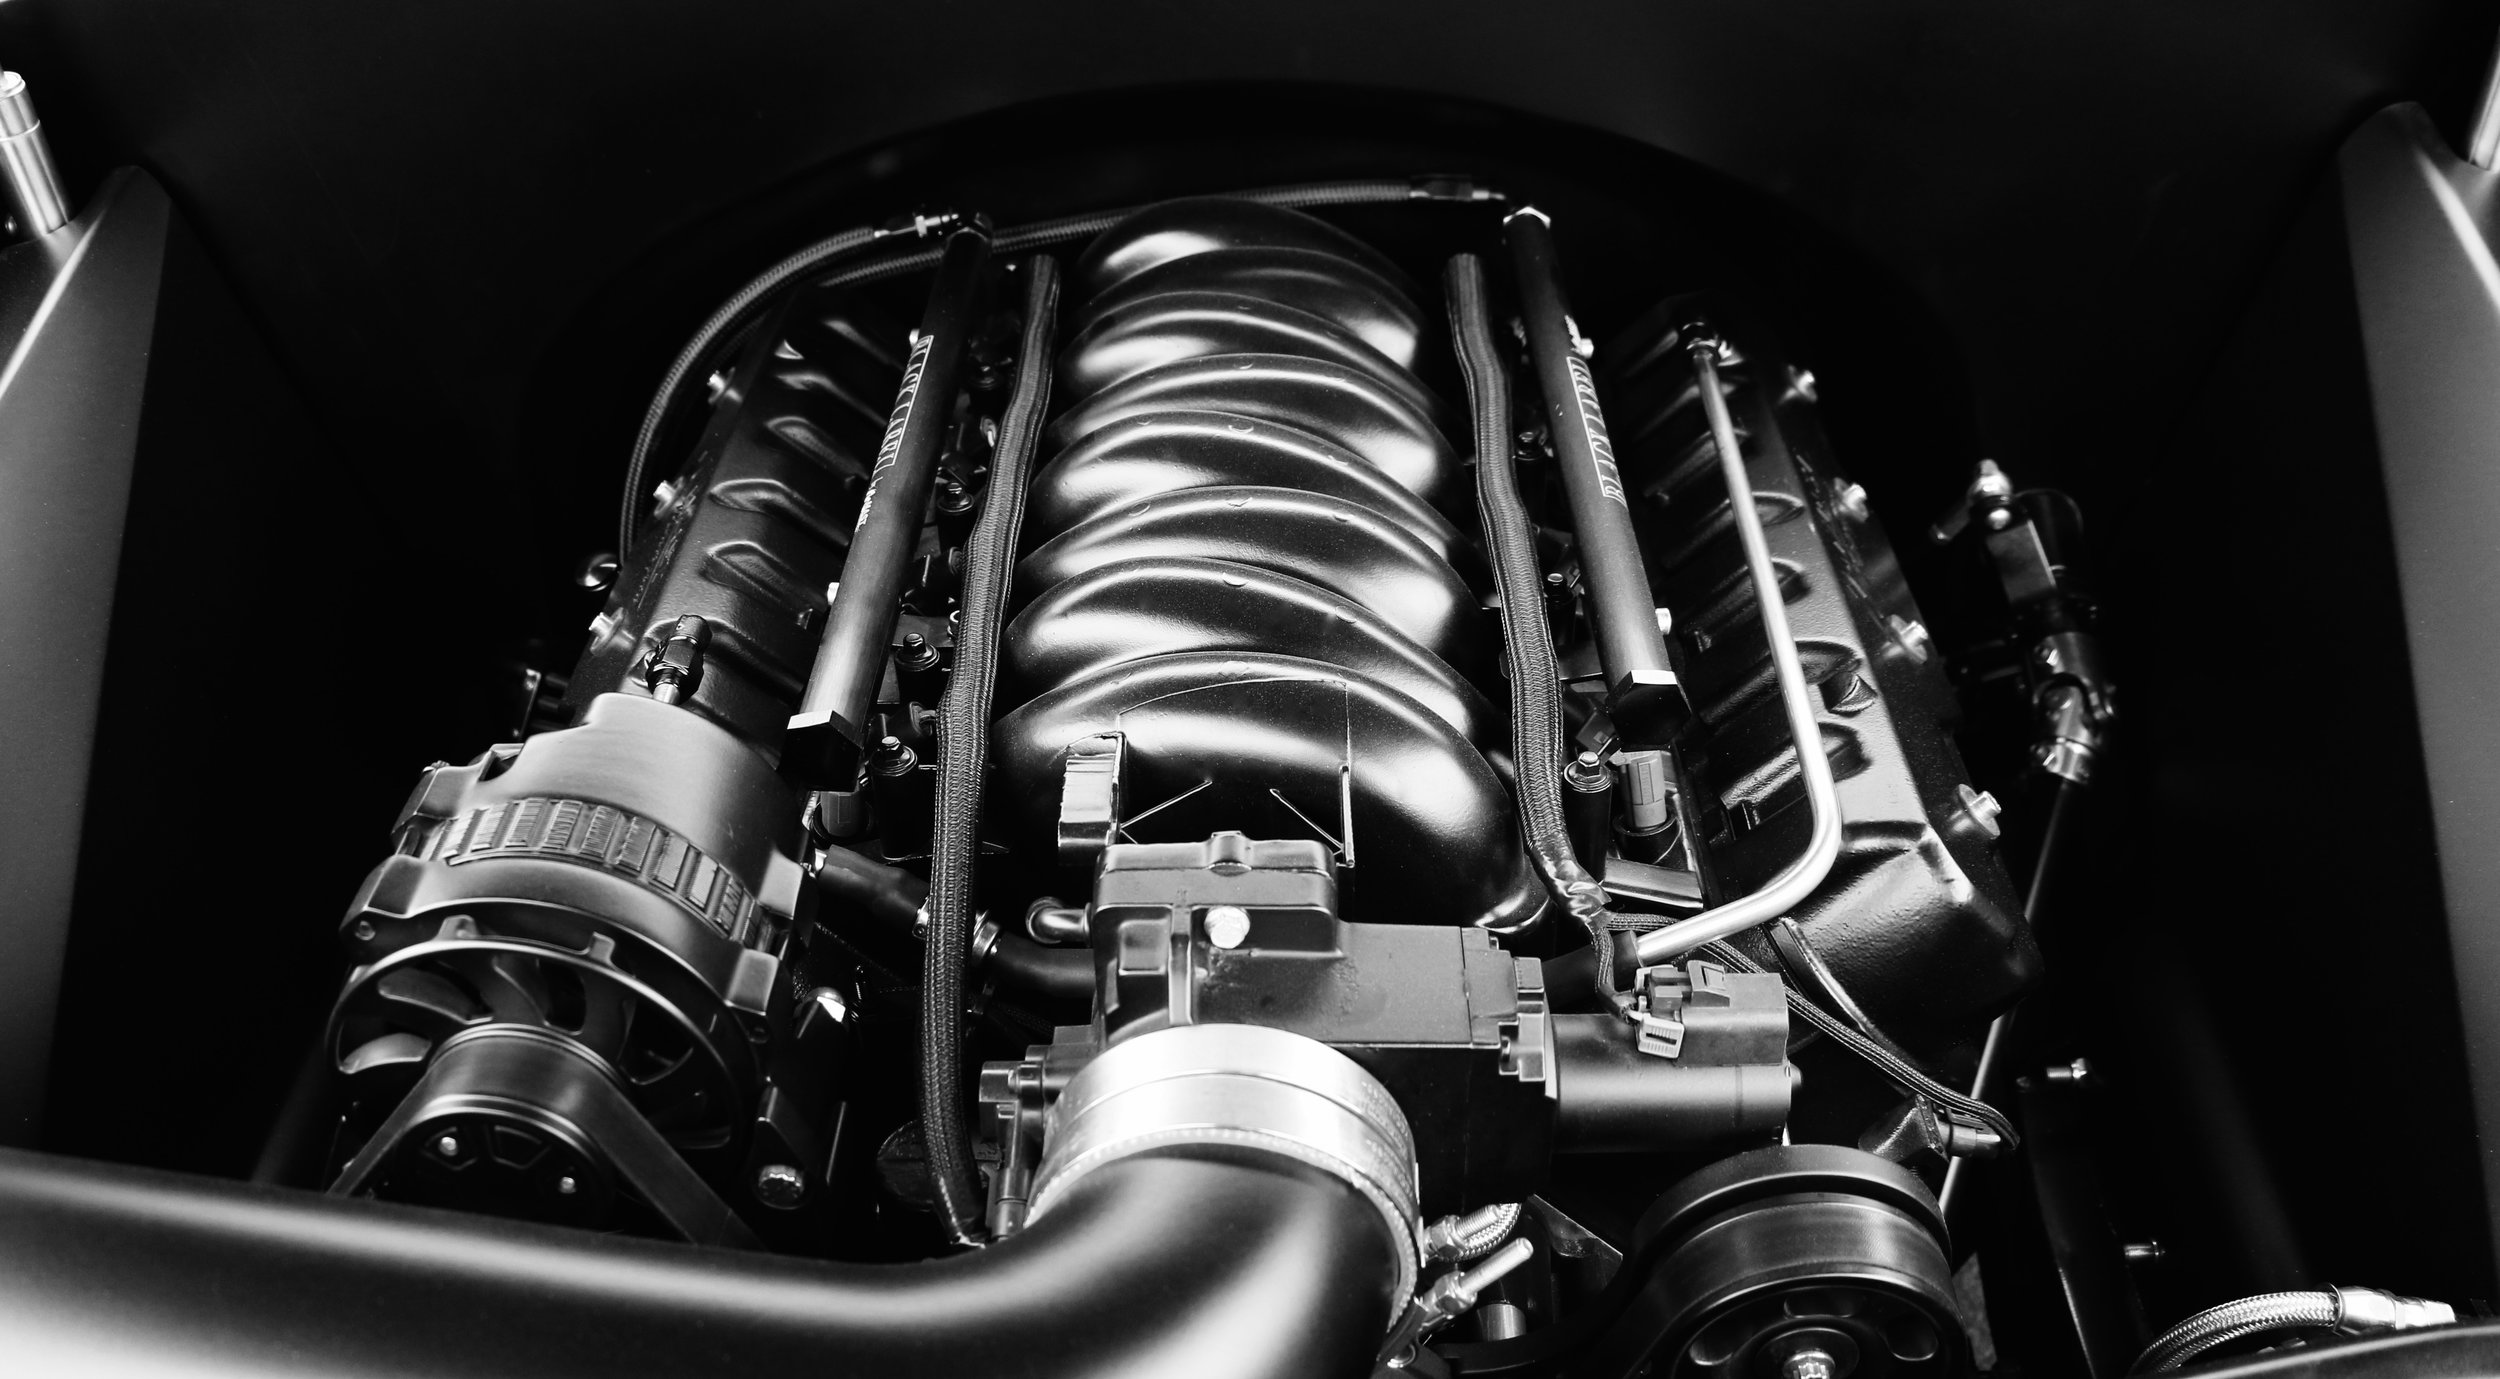 Black Chevy engine